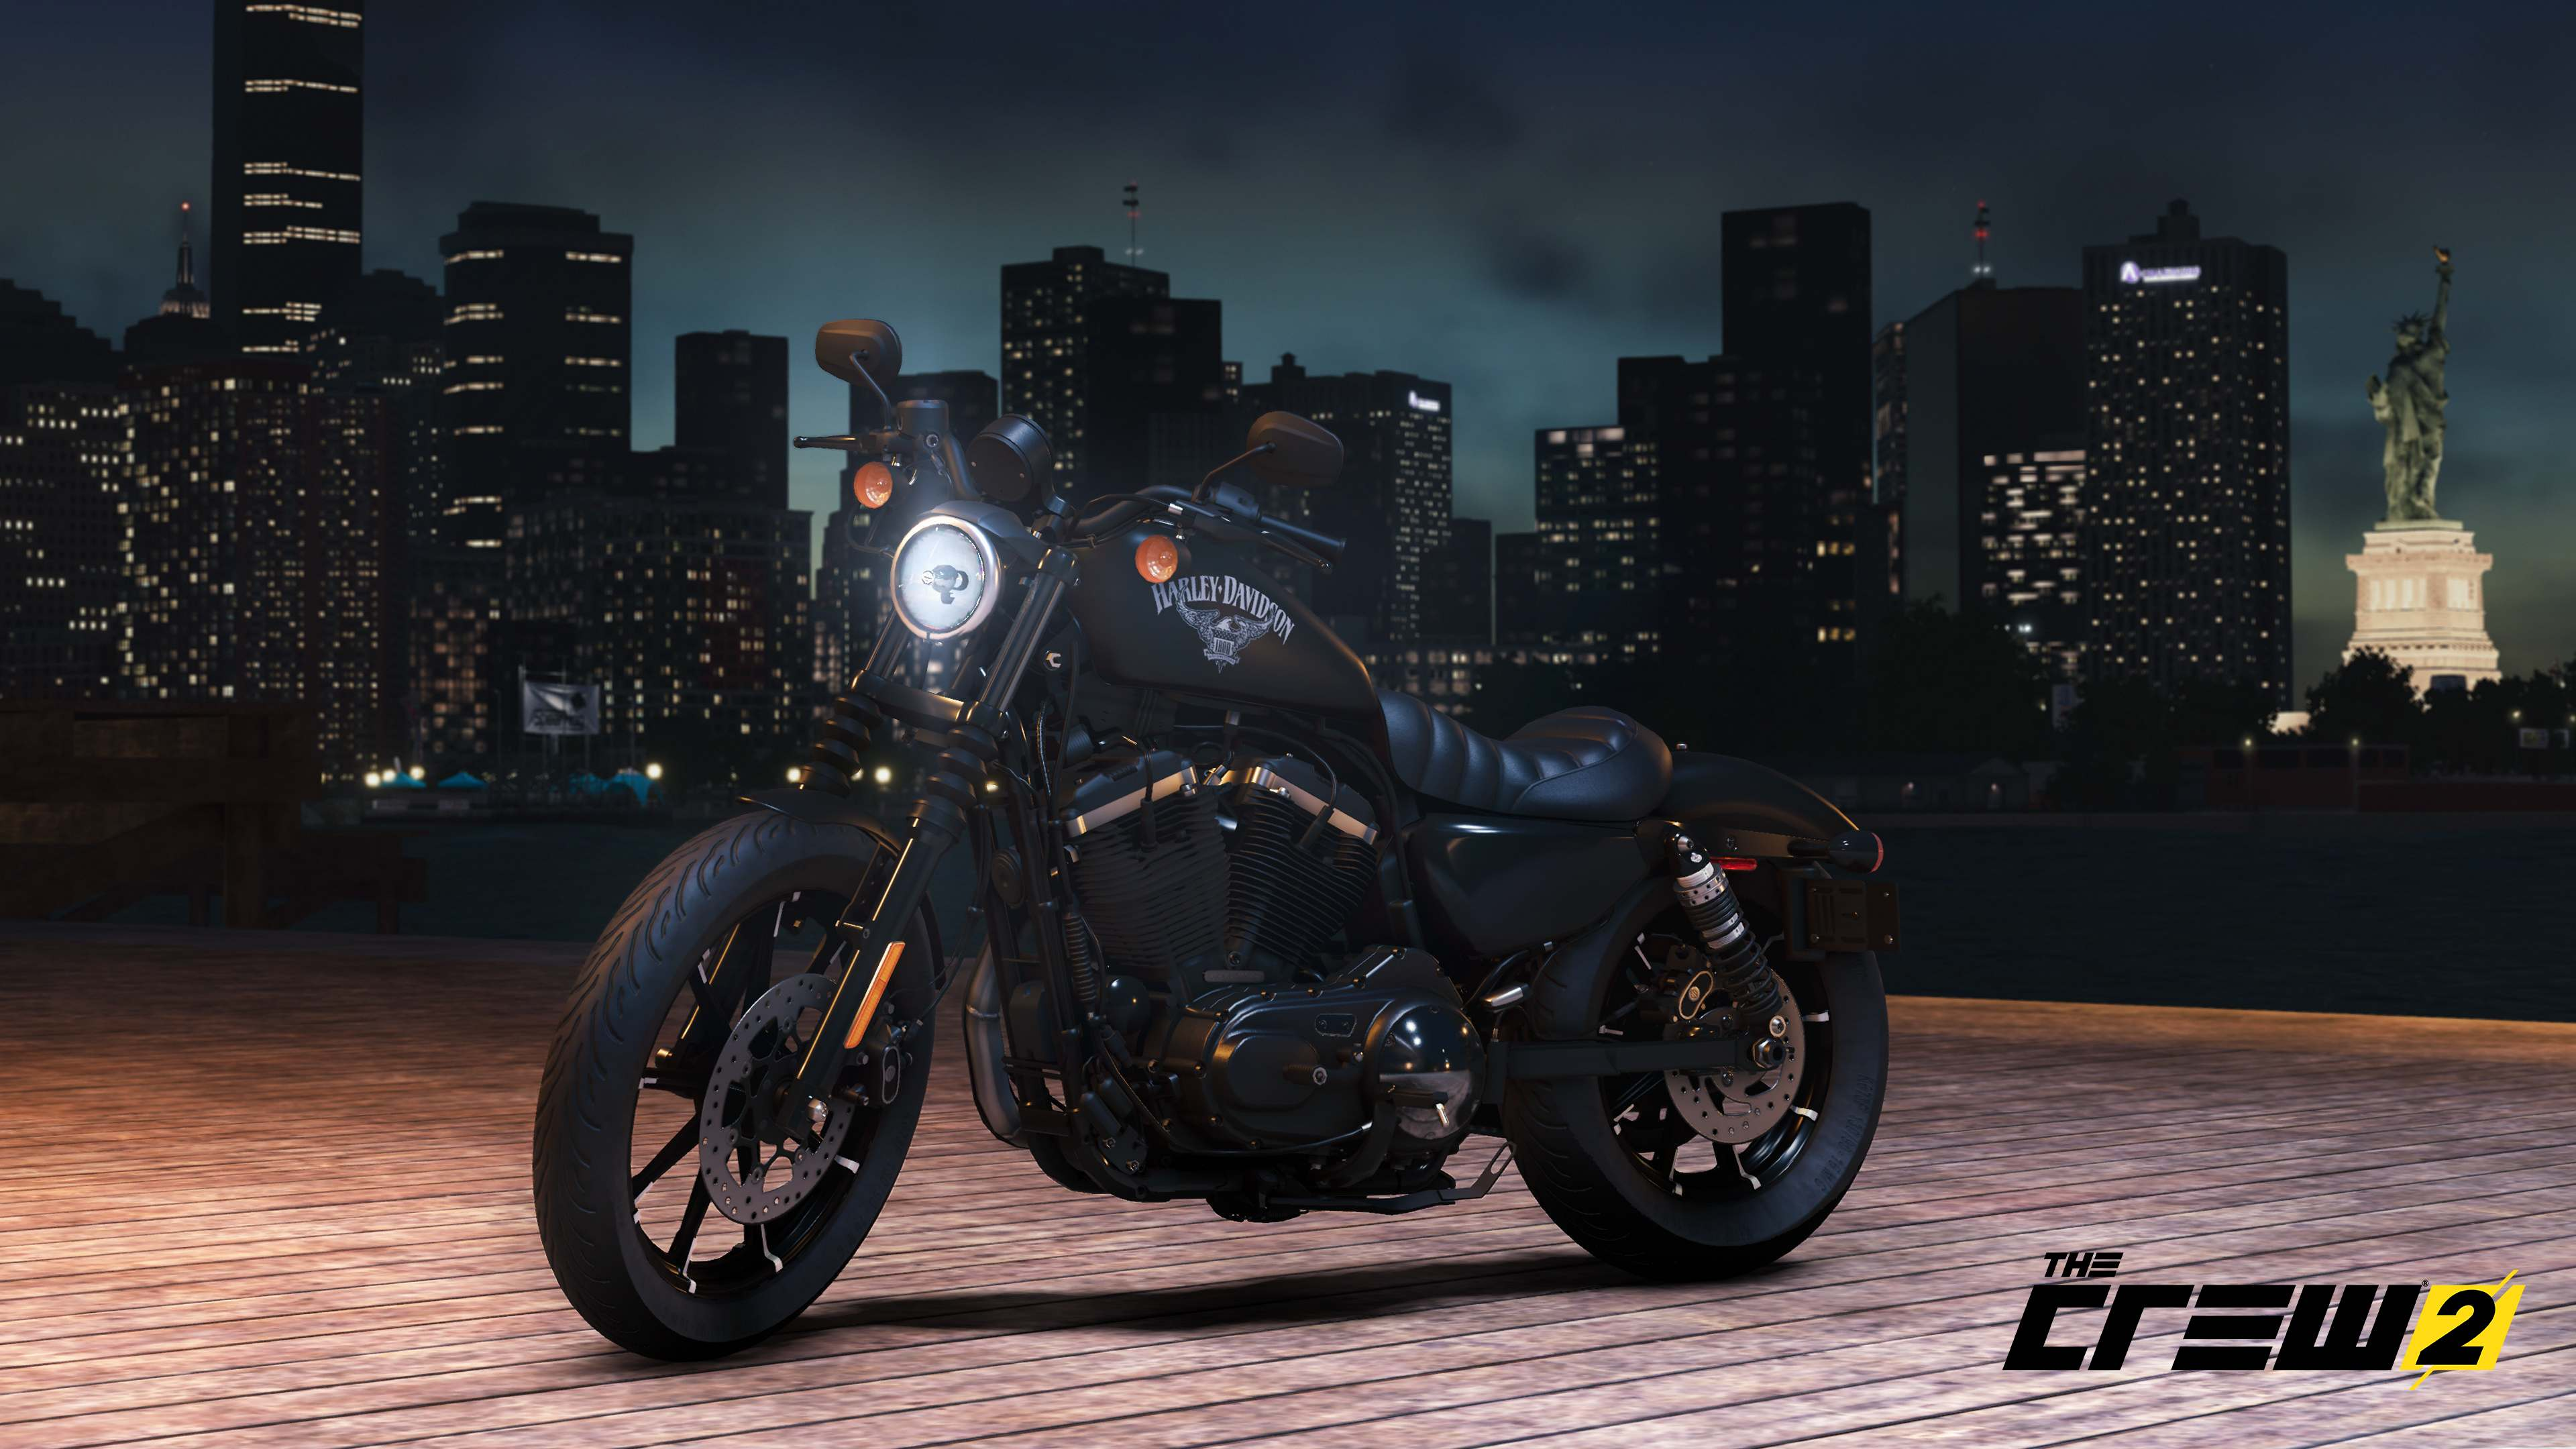 The Crew 2 Harley-Davidson